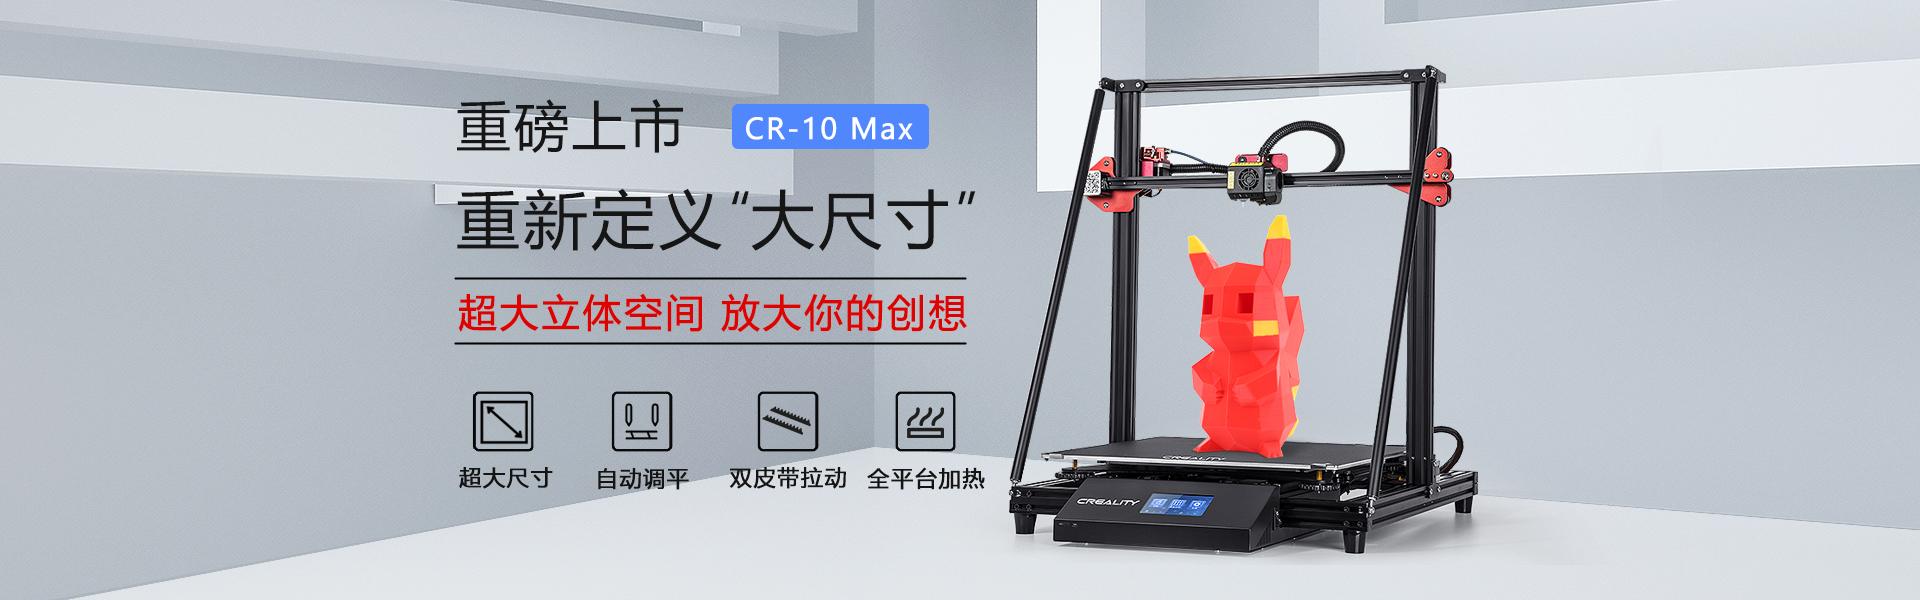 重磅上市 CR-10 Max 3D打印机